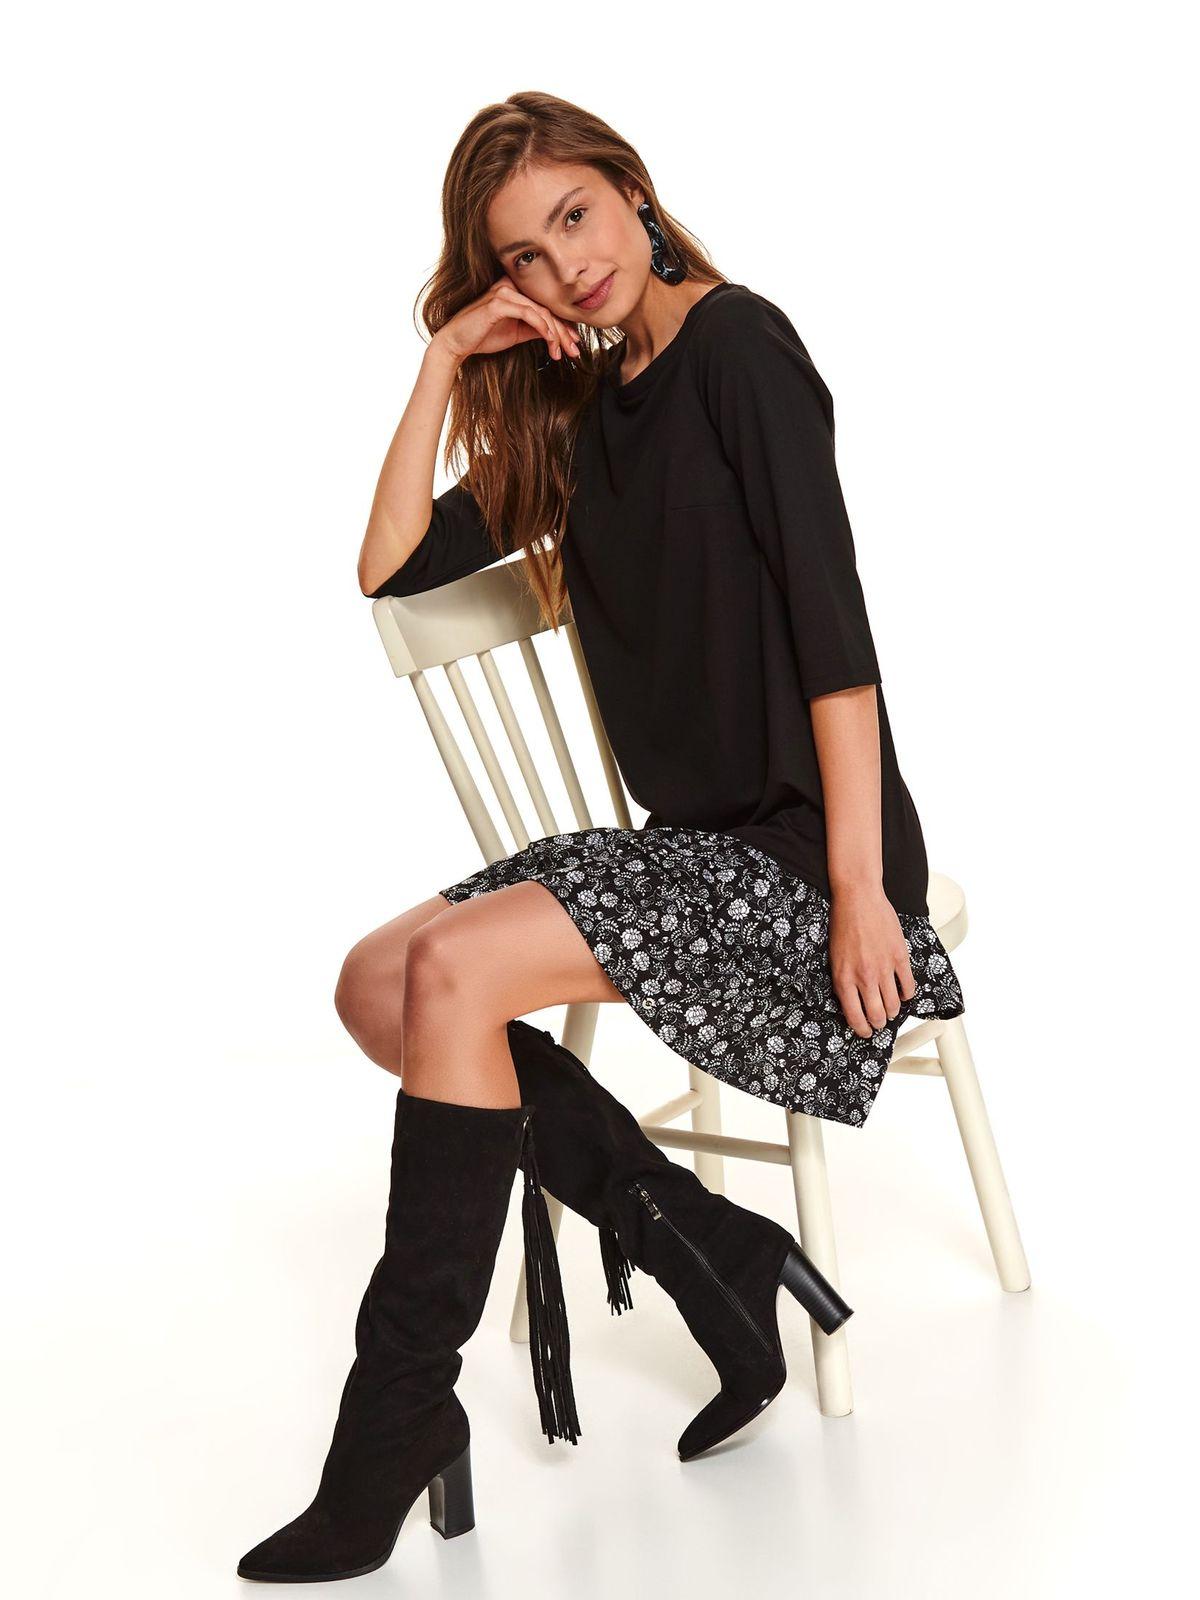 Rochie Top Secret neagra de zi scurta cu un croi drept cu volanase la baza rochiei